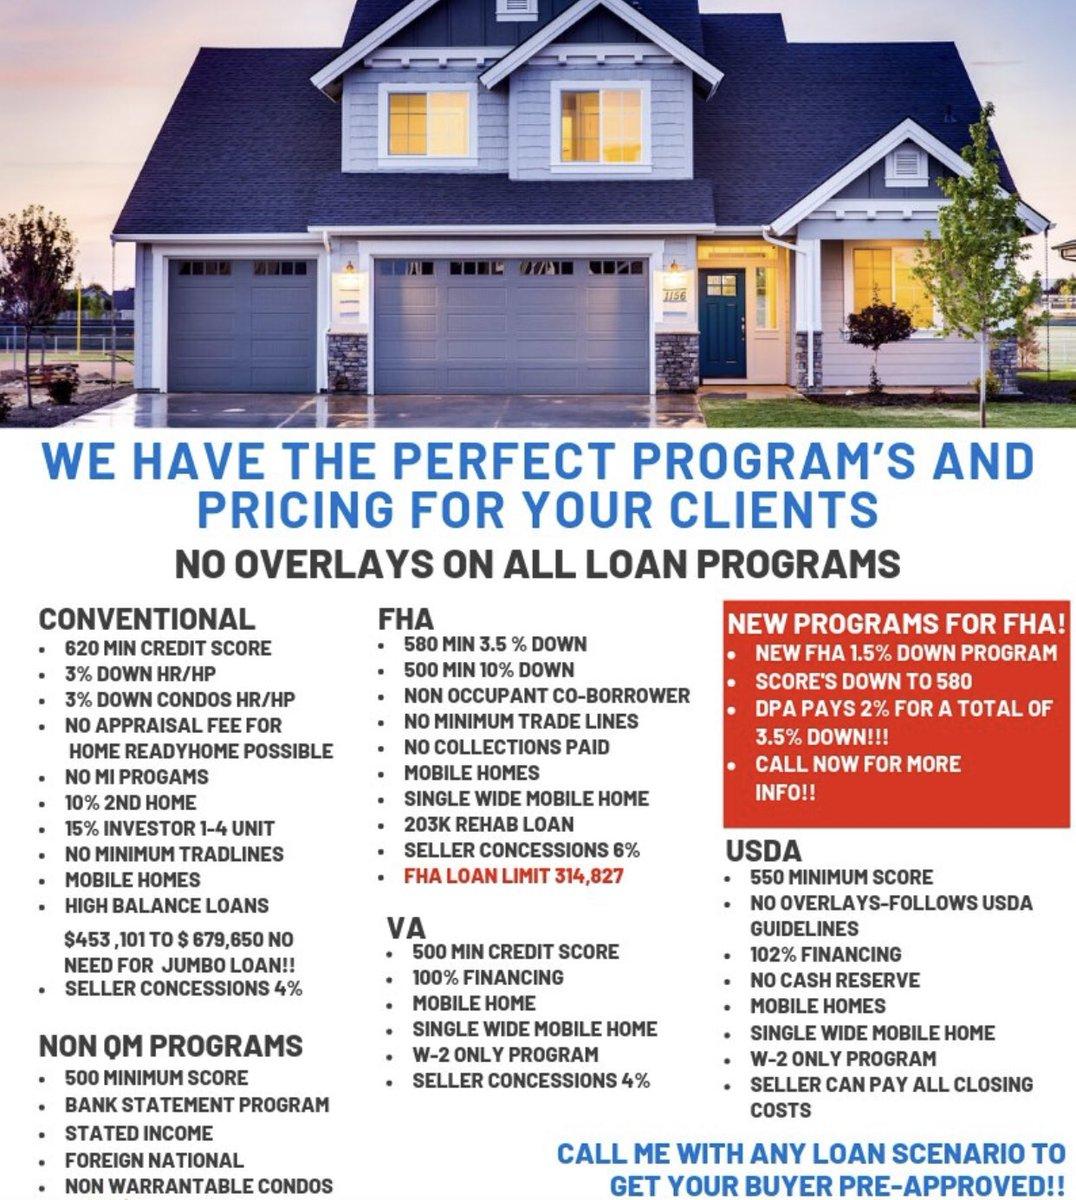 550 Credit Score Home Loan >> Social Media Pcglending Twitter